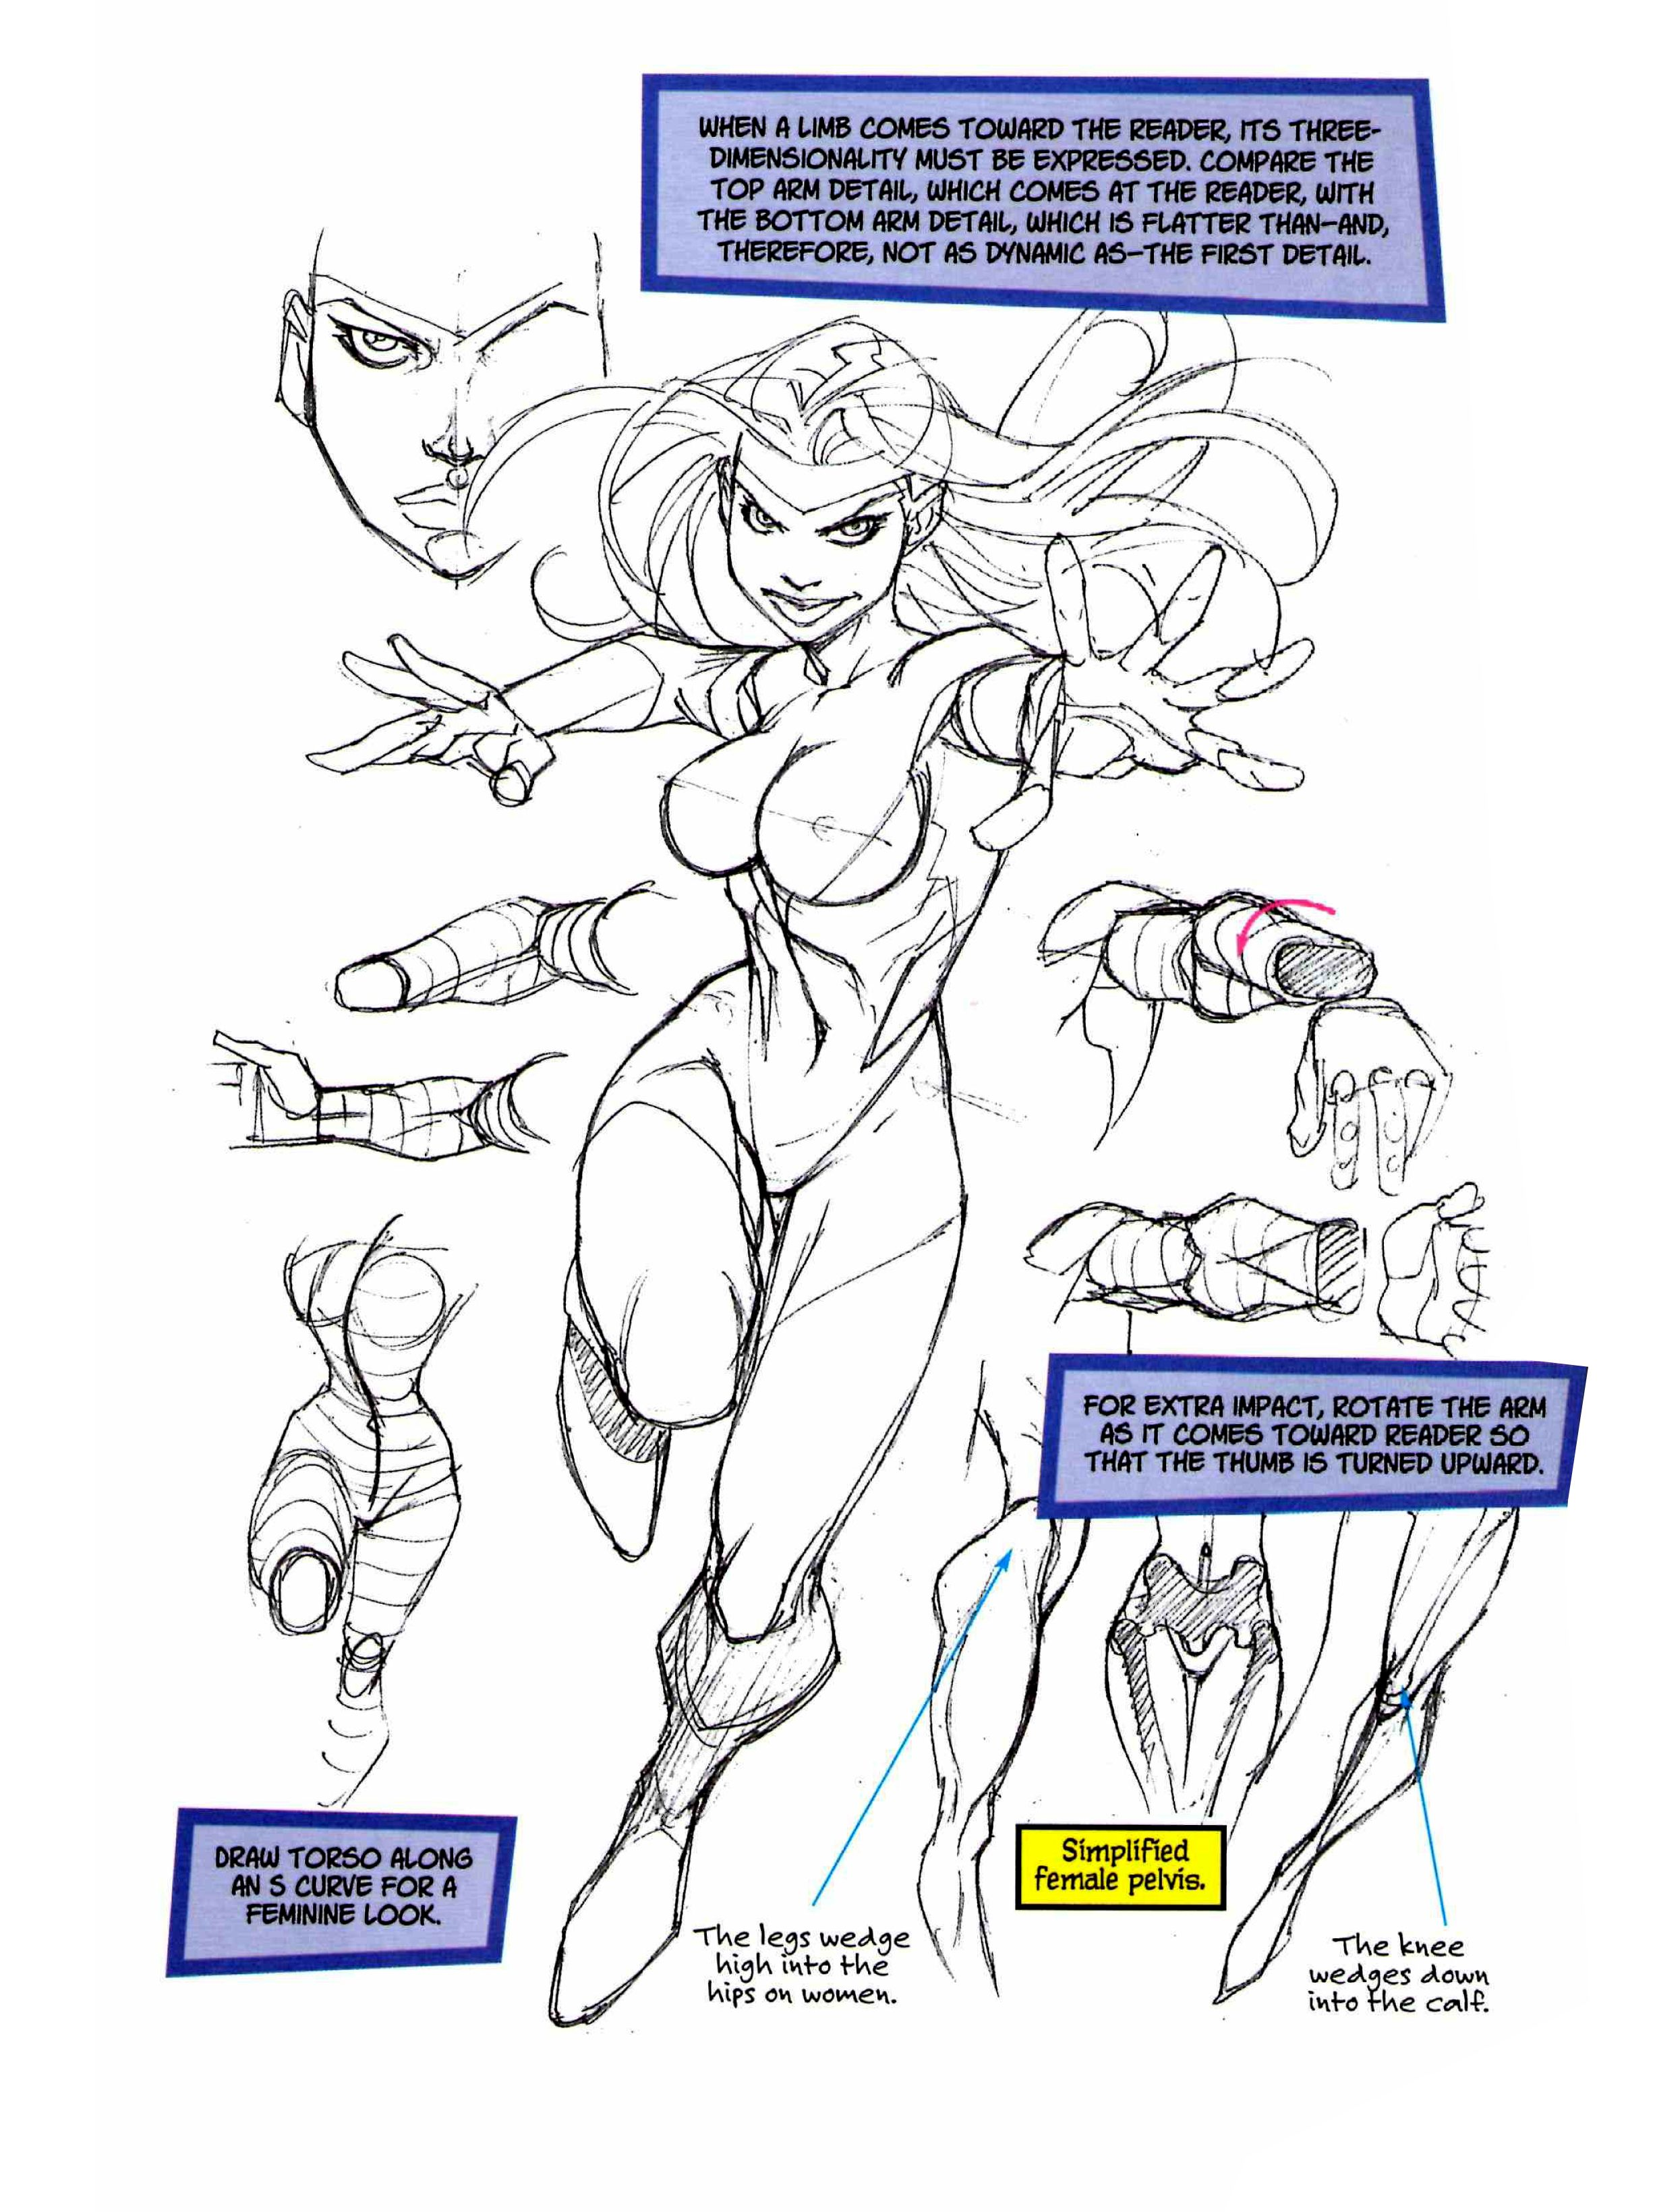 Roger Cruz - Drawing Cutting Edge Fusion | HOW TO COMIC BOOK STUFF ...